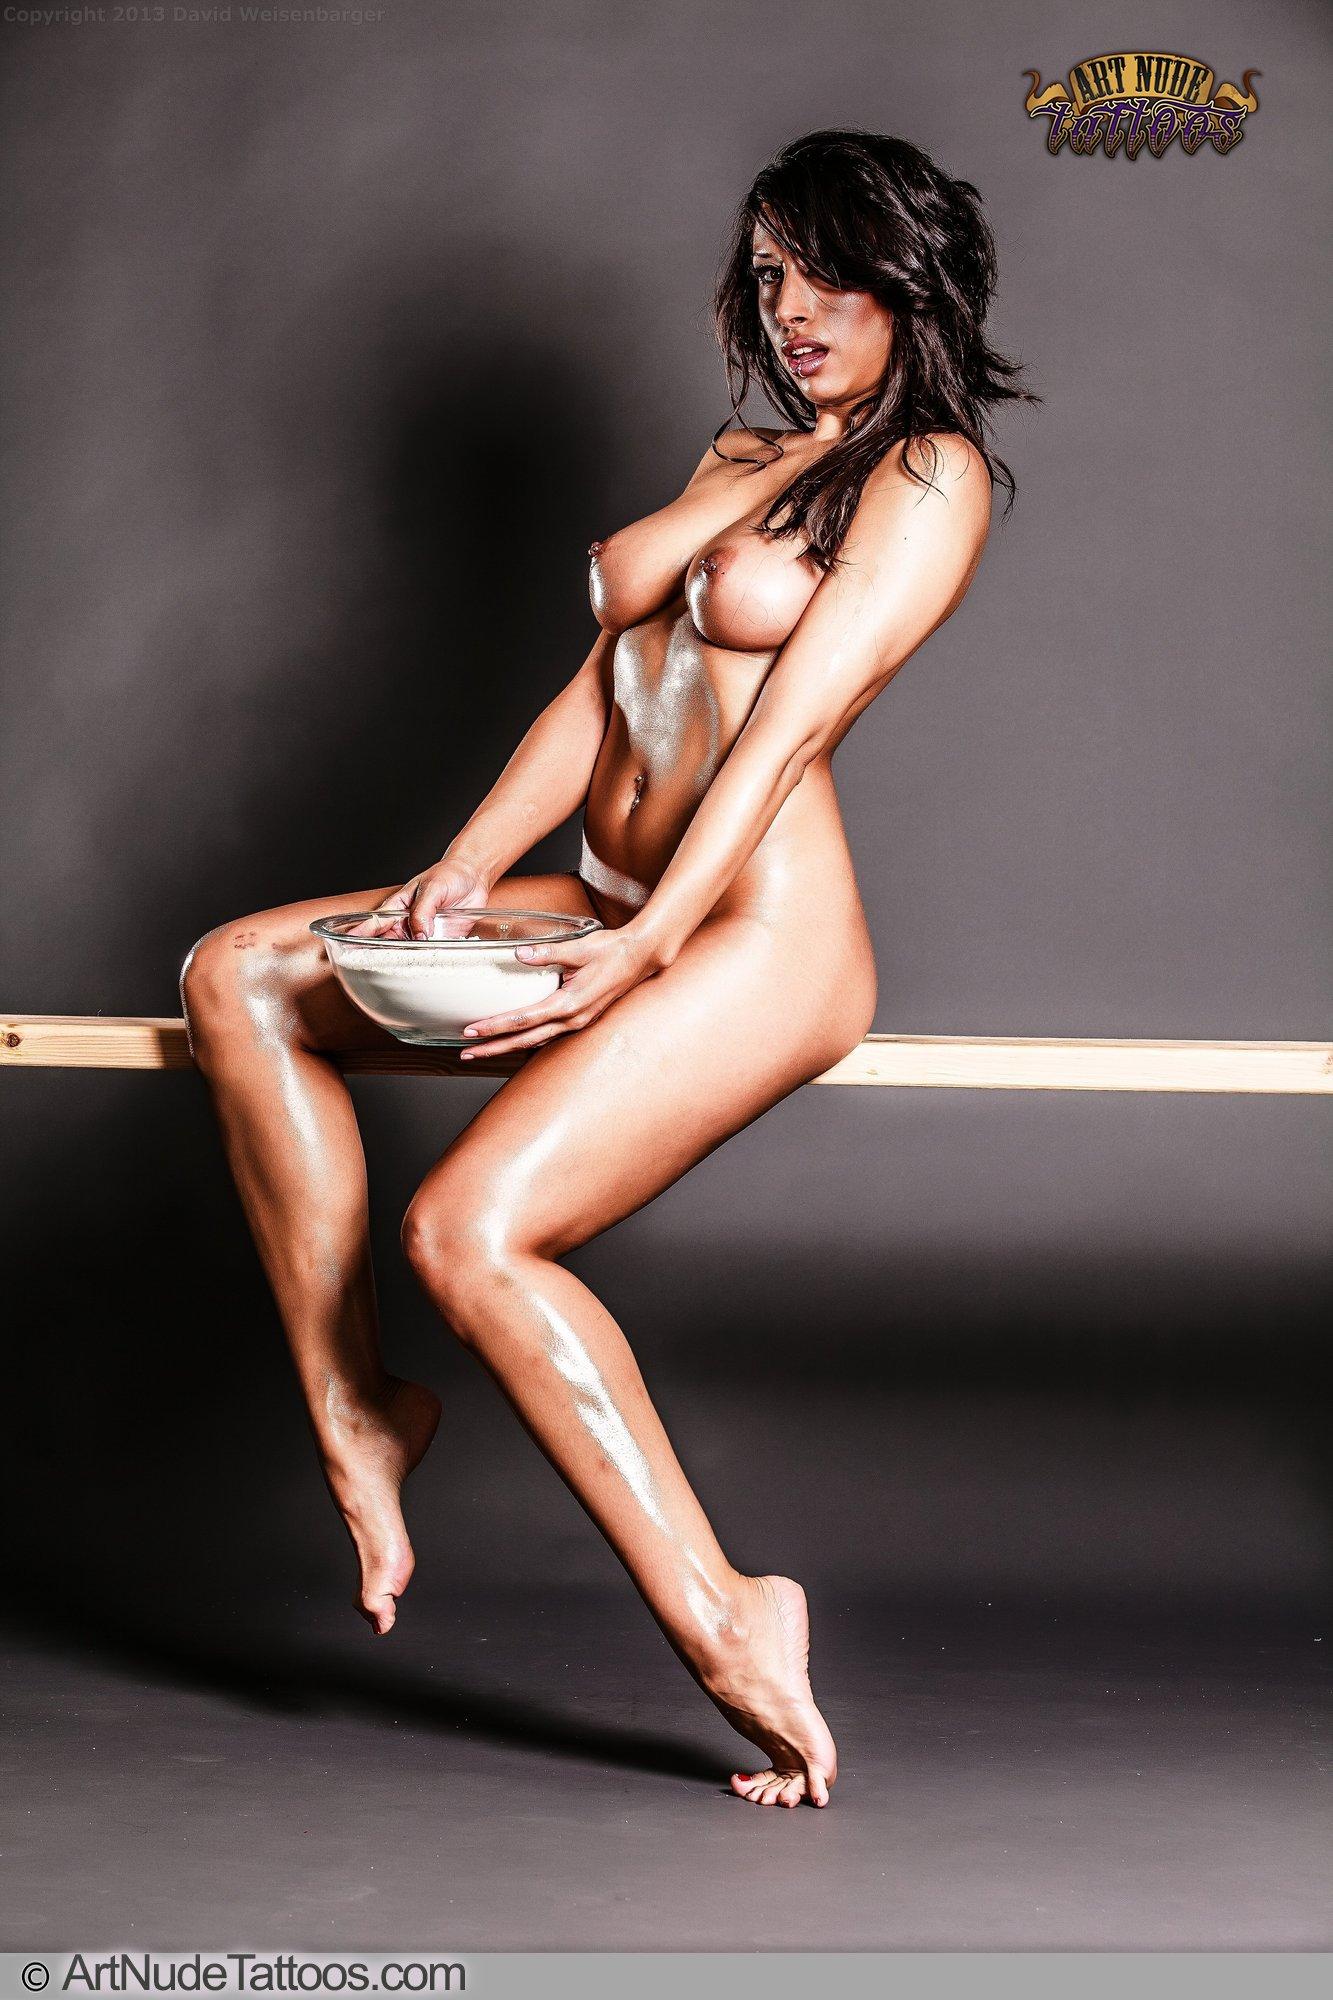 Suspense - Brianna - Art Nude Tattoos 63129-1042